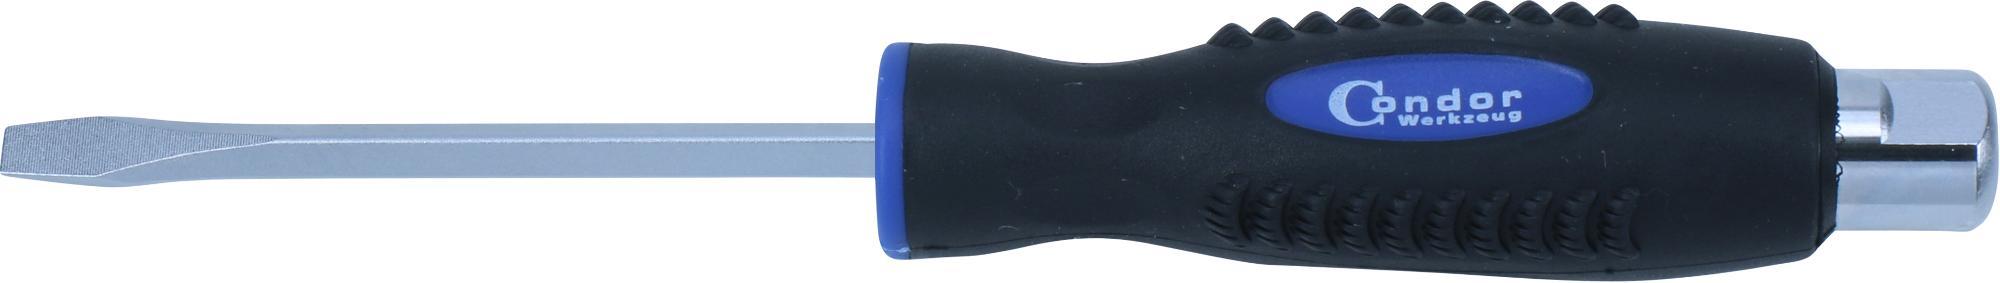 Screwdriver, plain slot 5.5x100 mm